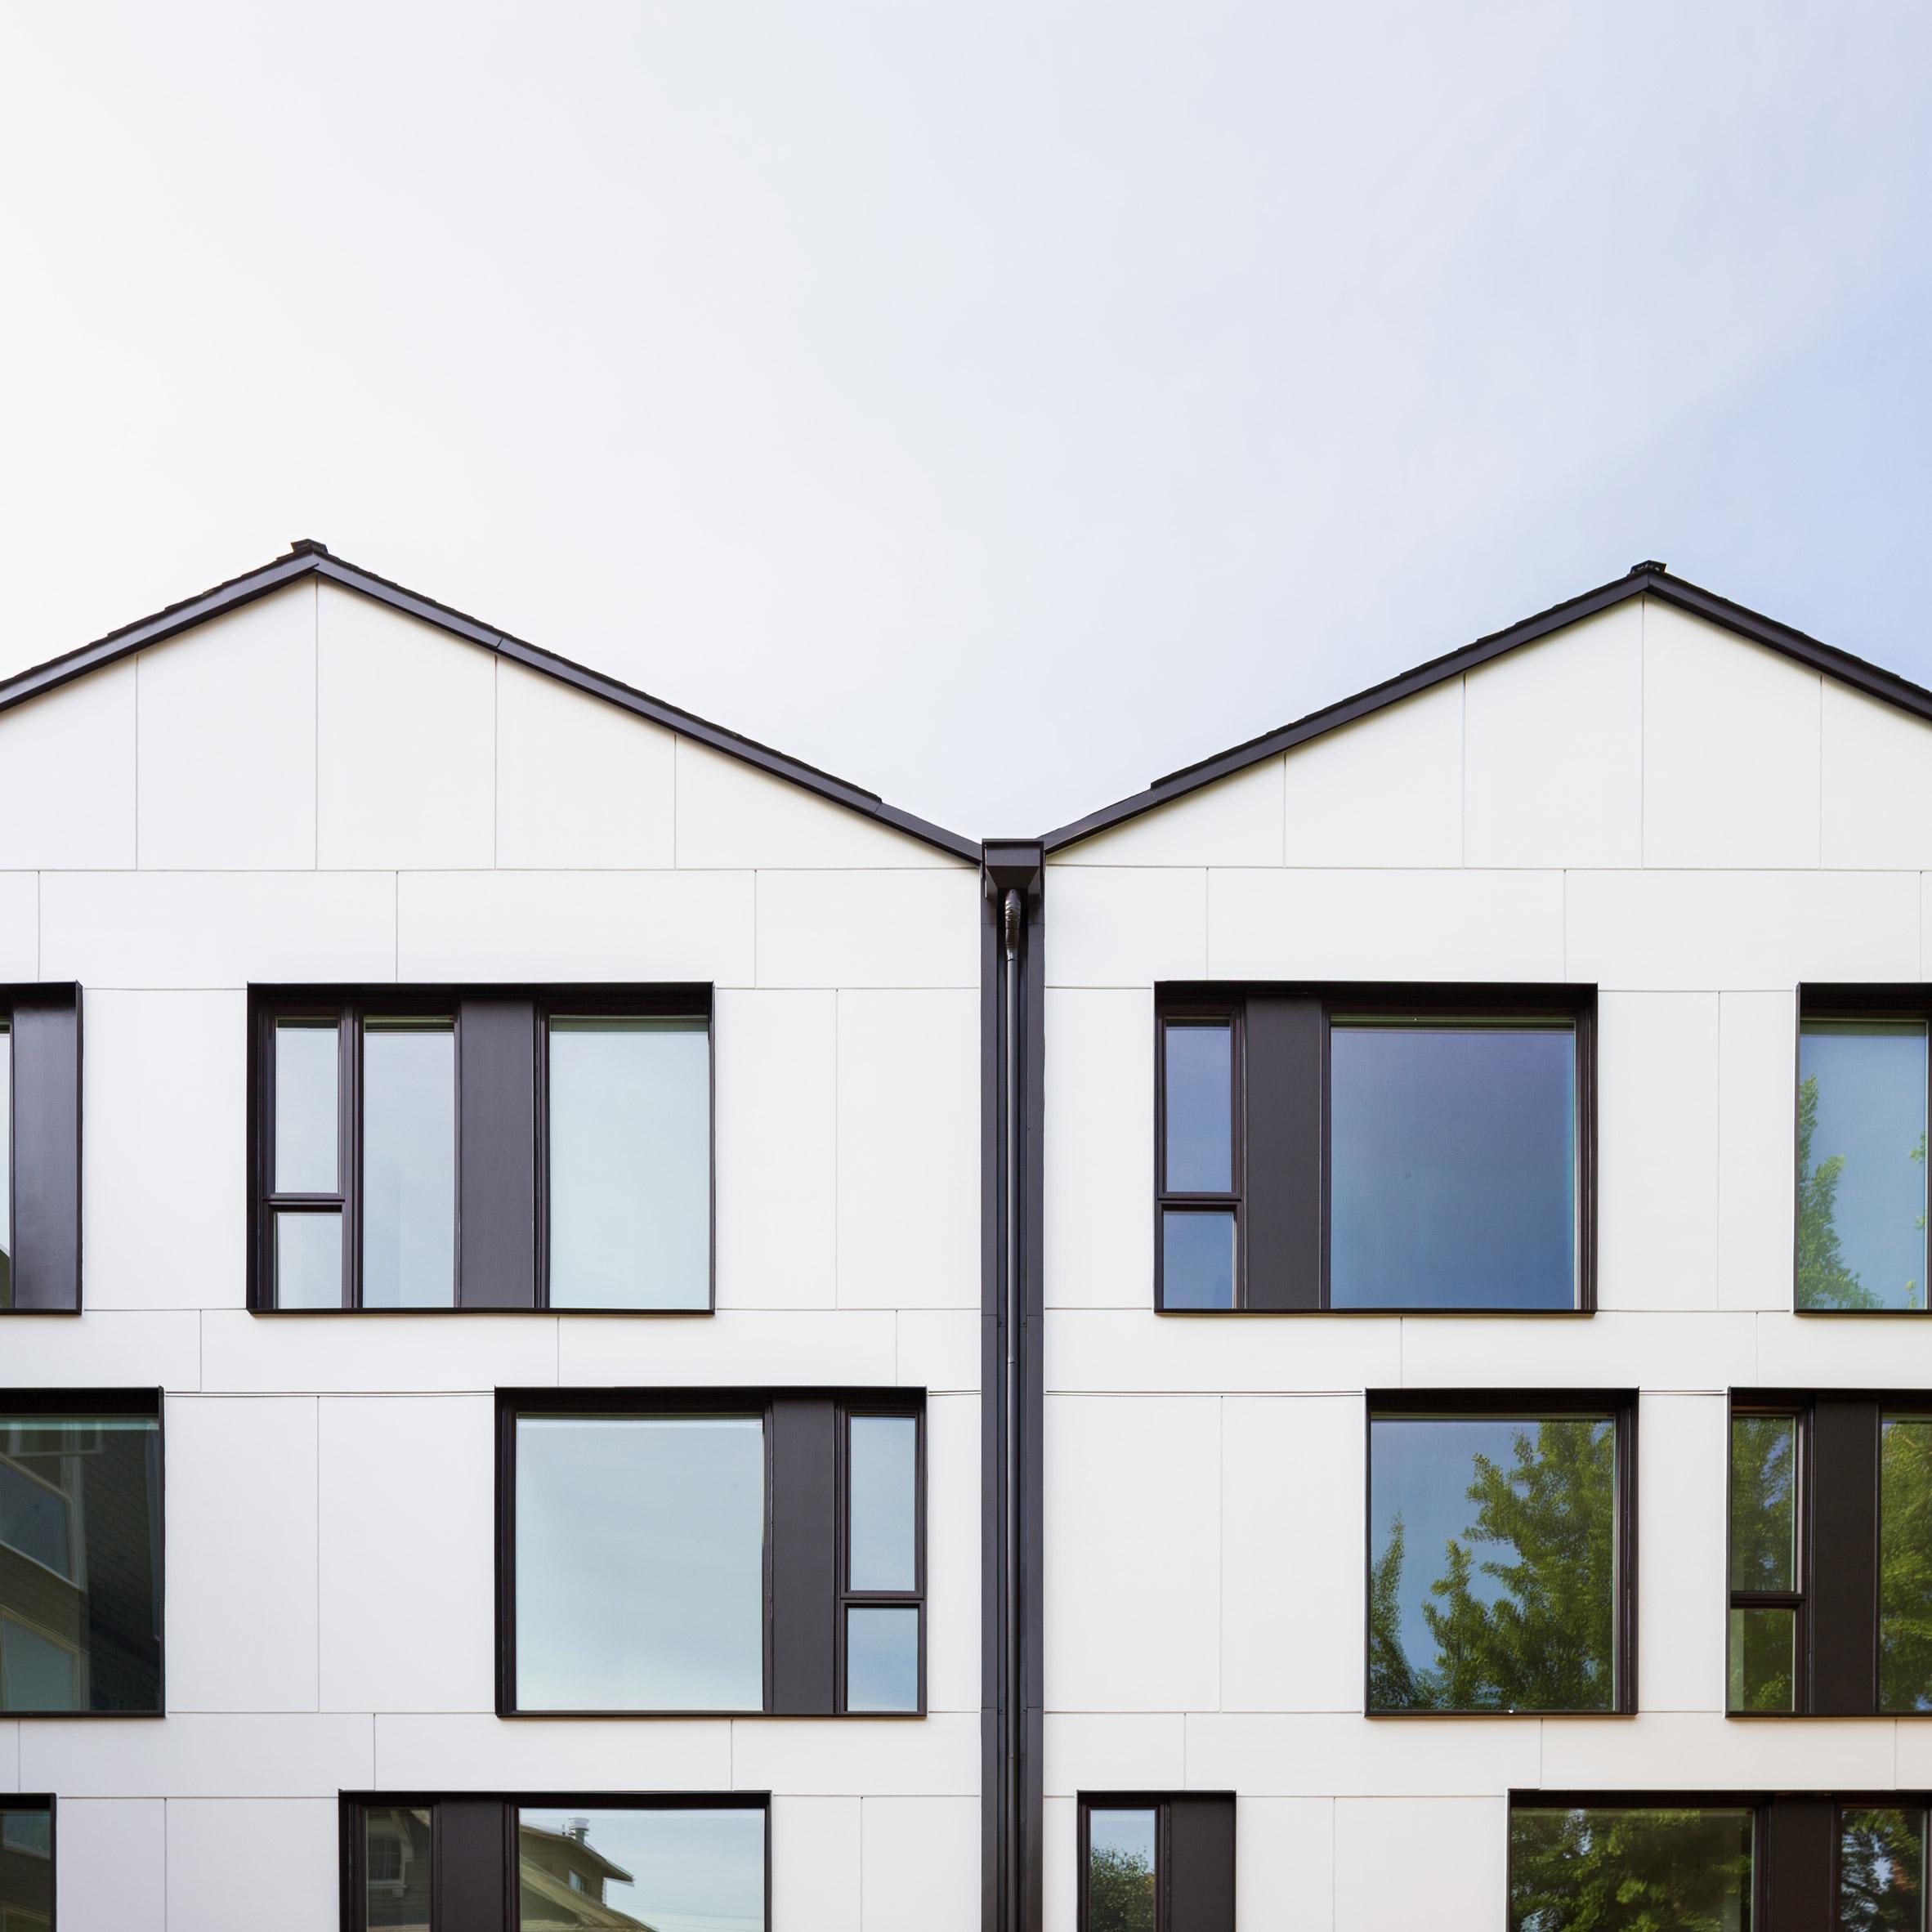 Gables archives minimal blogs for Apartment architecture